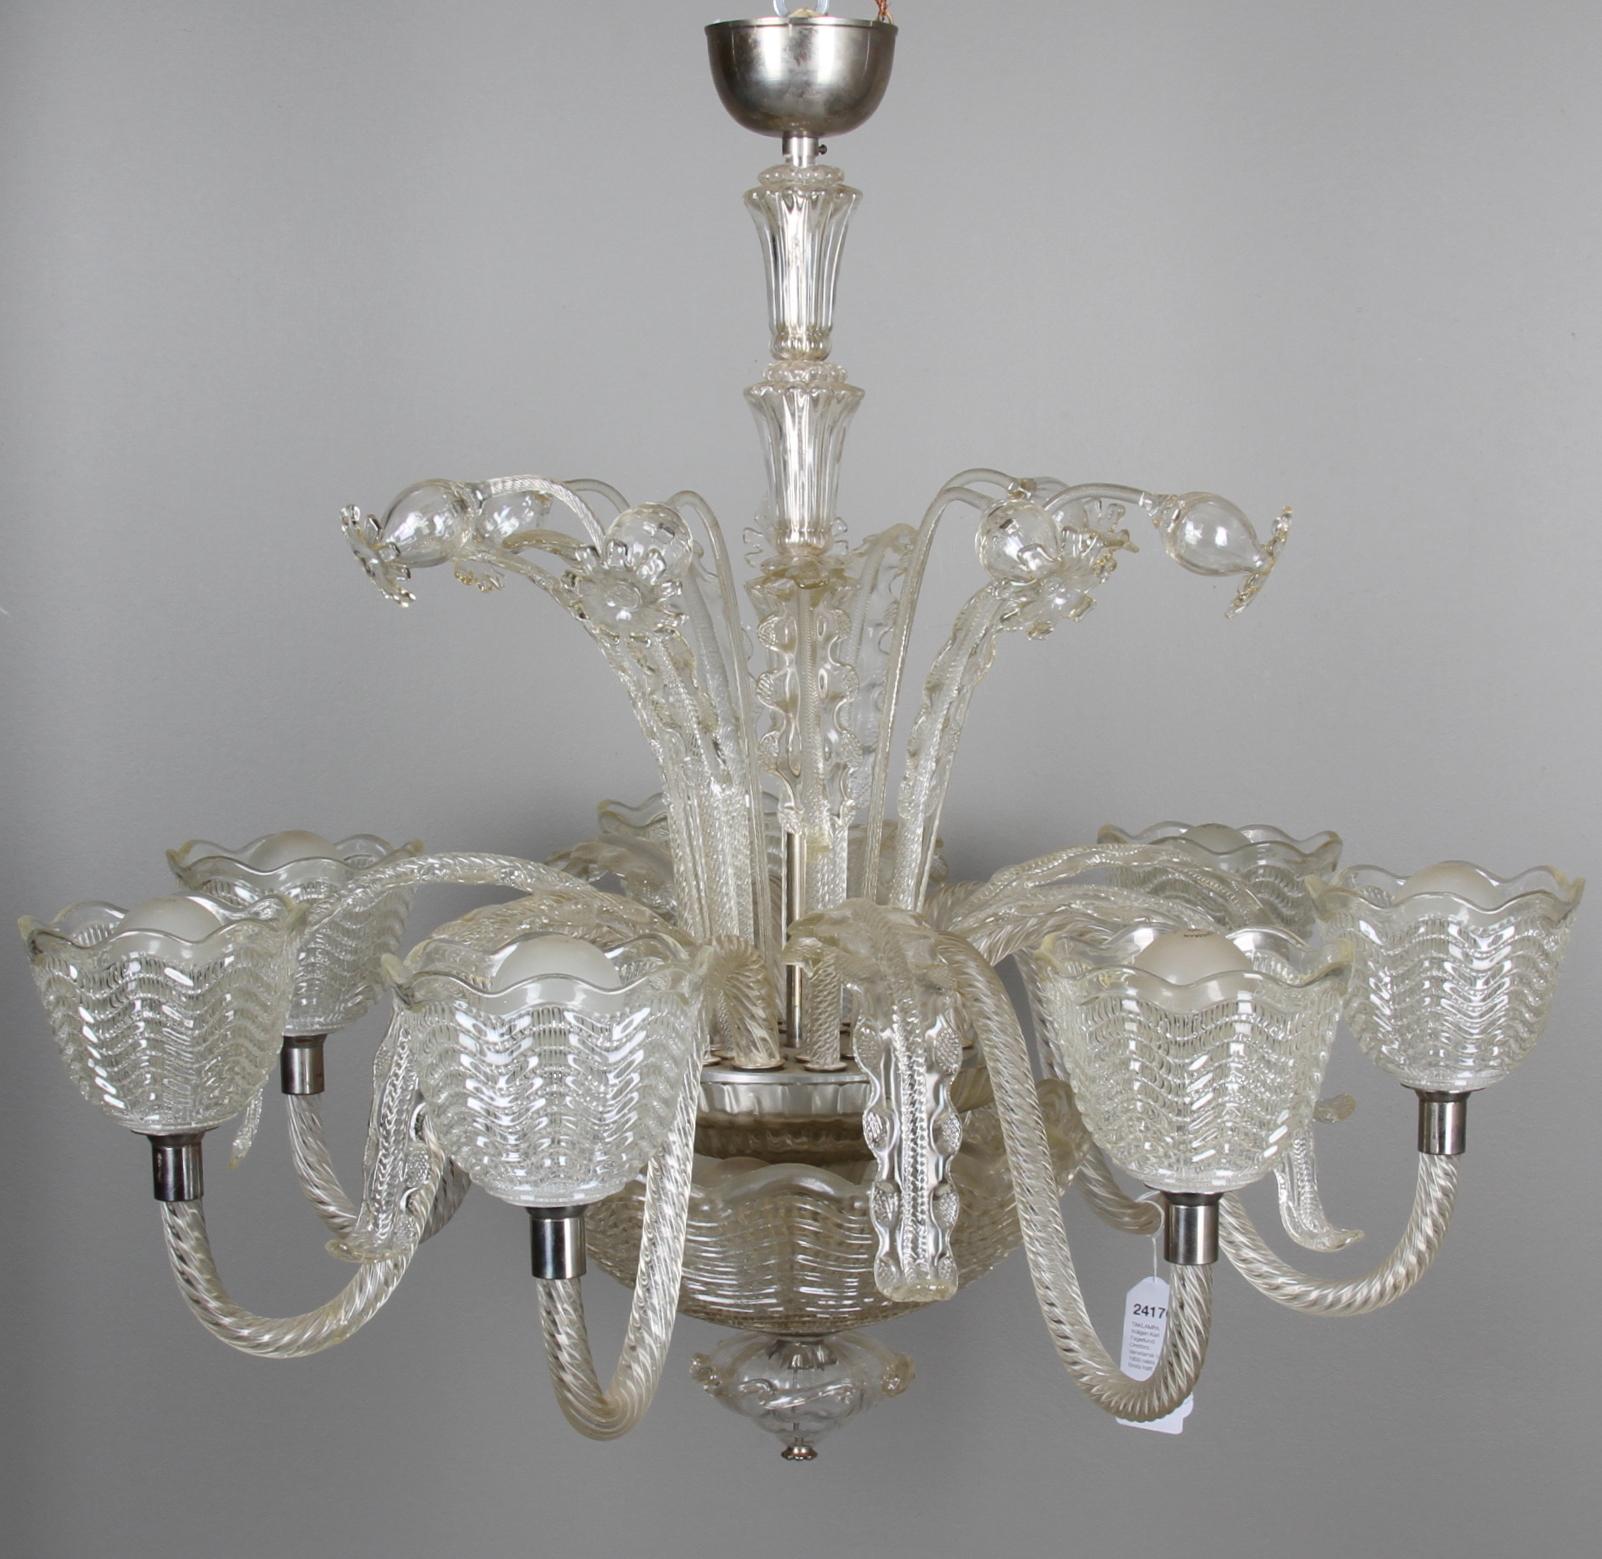 Golvlampa Carl Fagerlund - Bilder för 24170 TAKLAMPA, troligen Carl Fagerlund, Orrefors Venetiansk typ 1900 talets